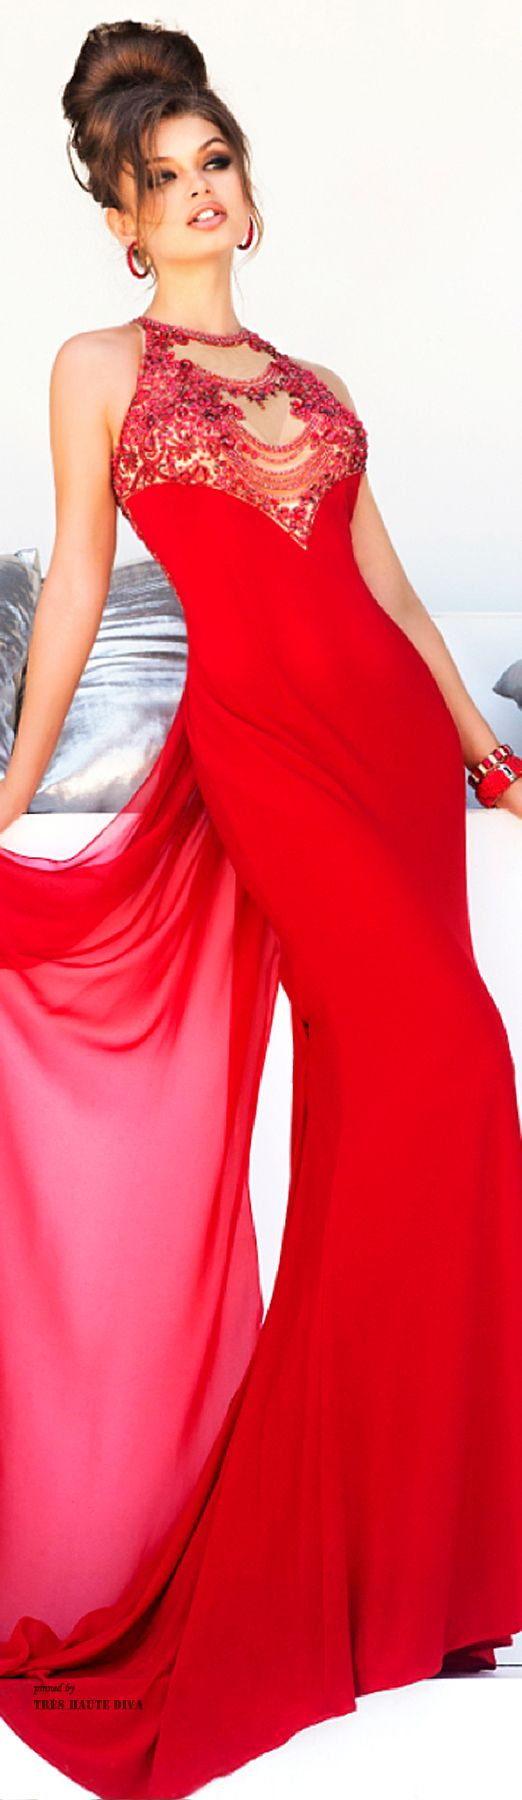 Mariage - Red Fashion